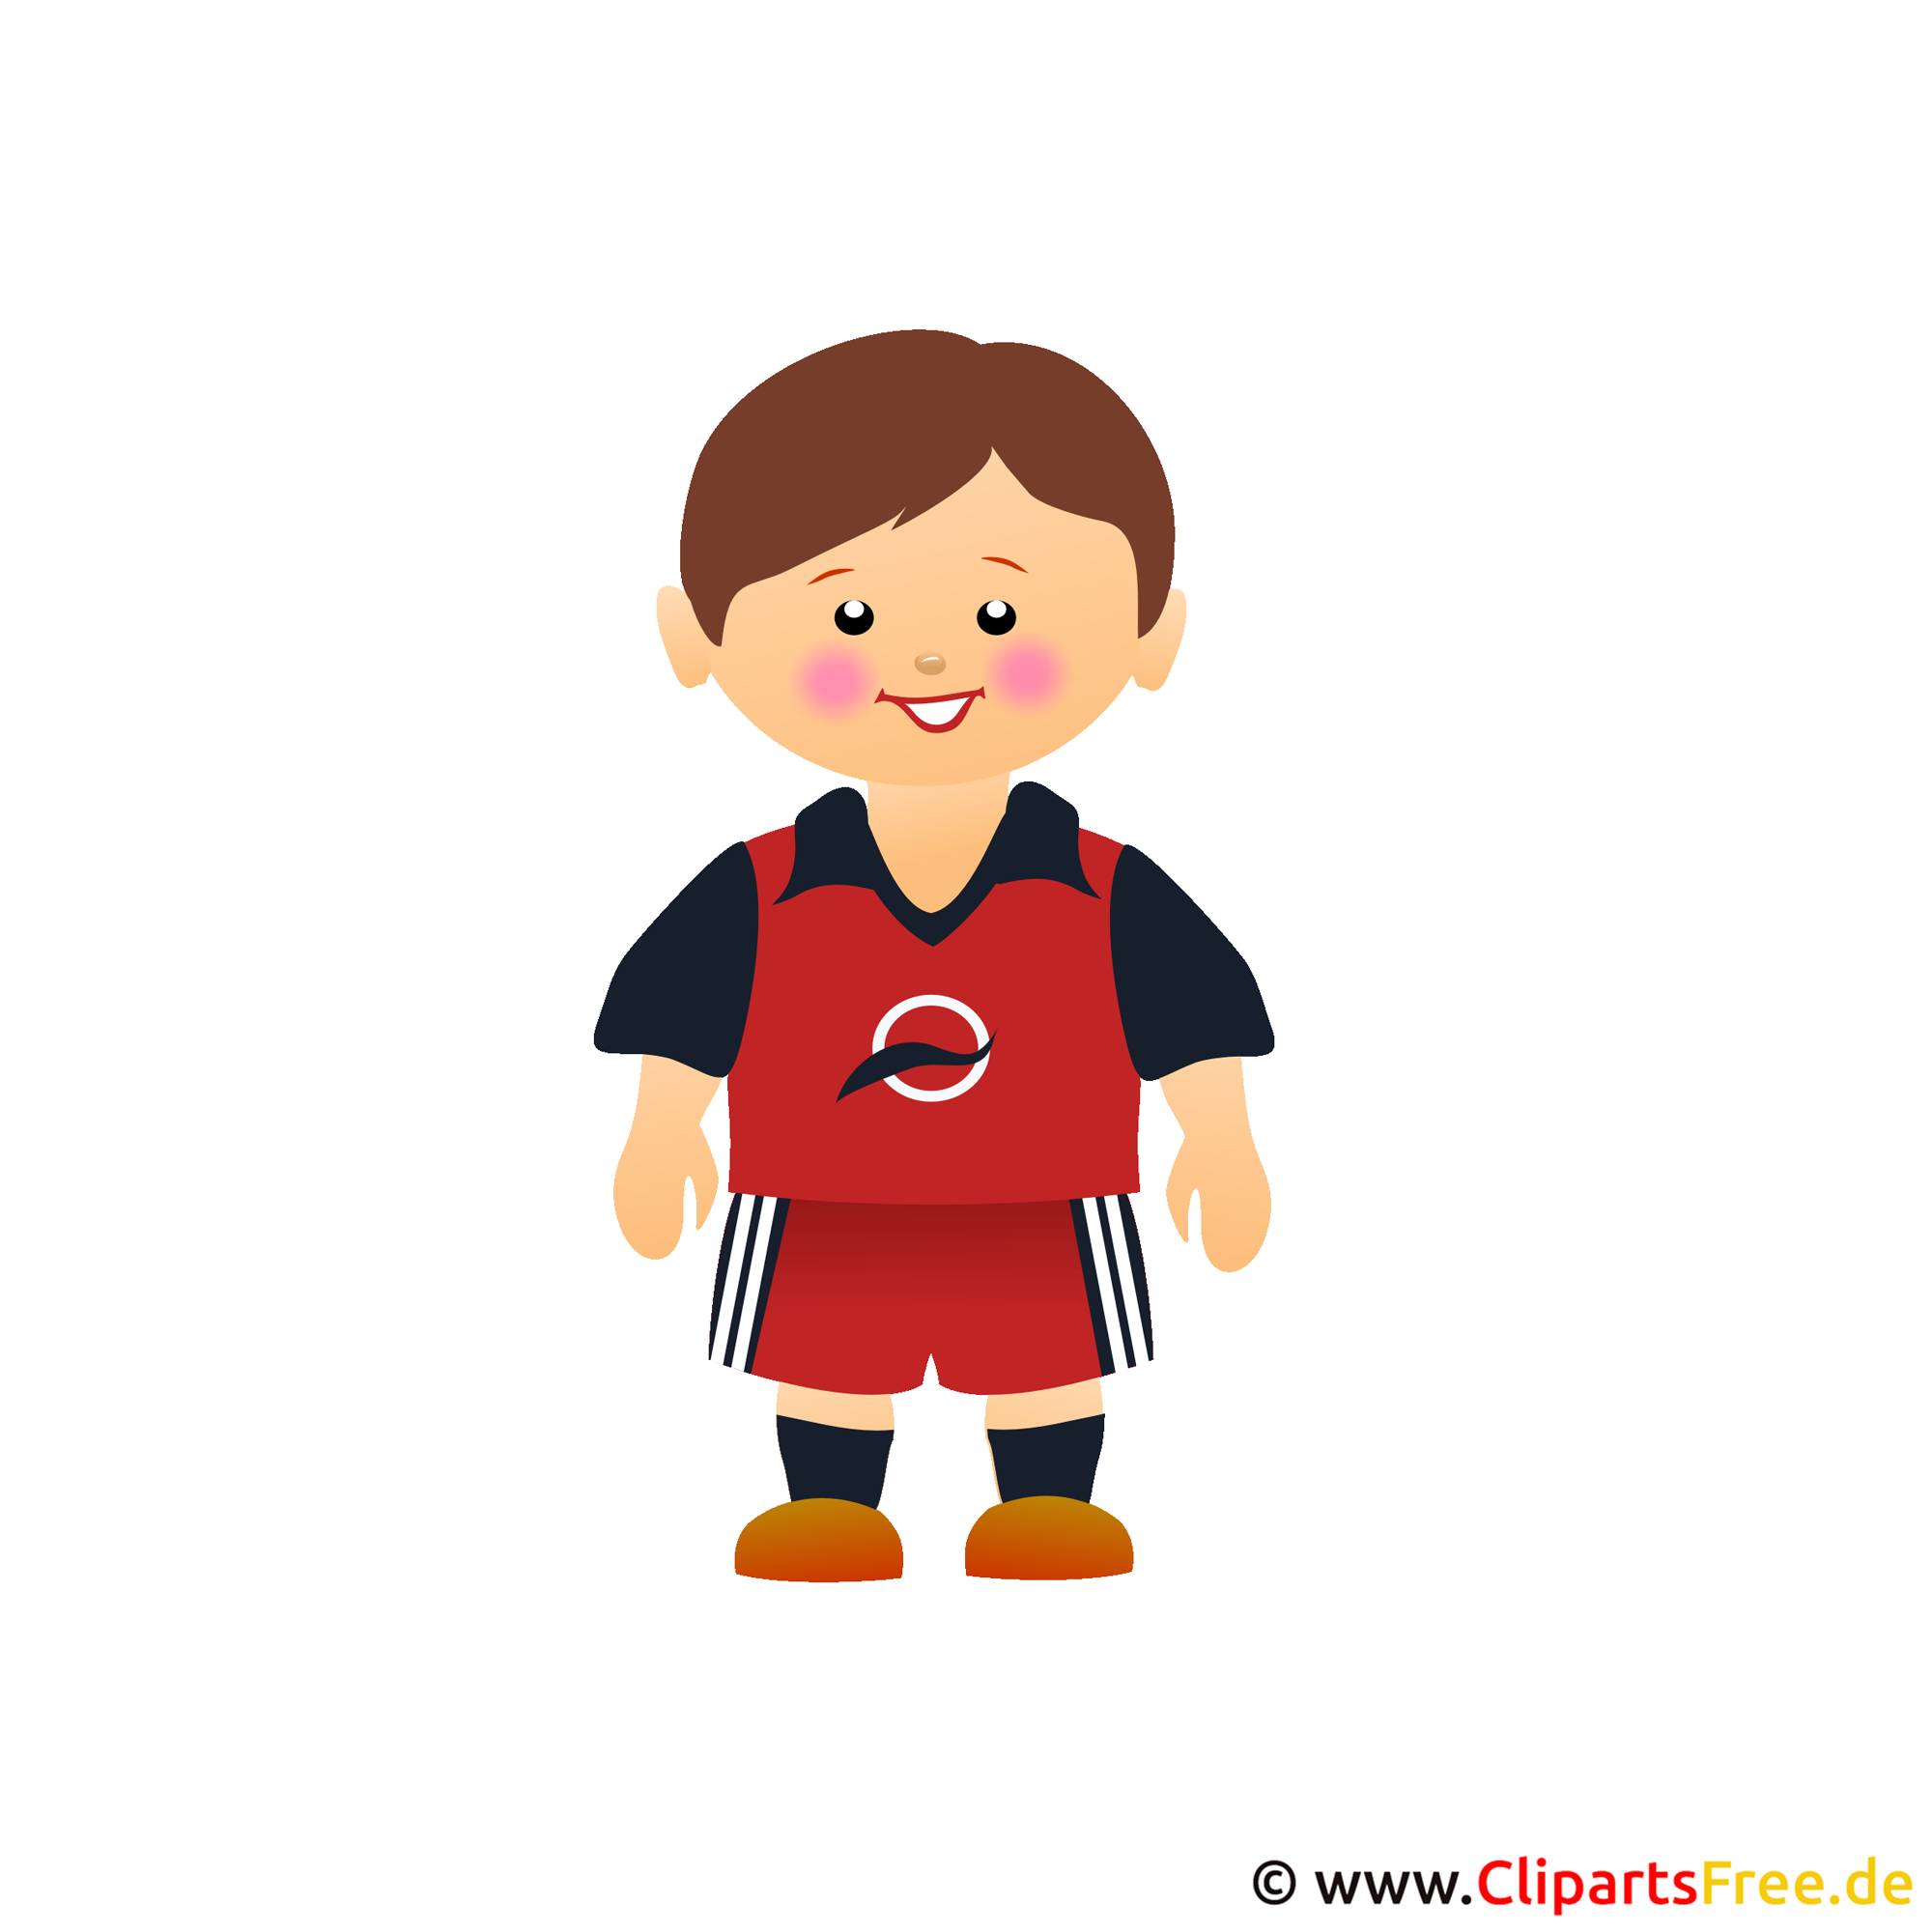 Fussballspieler Bild-Clipart